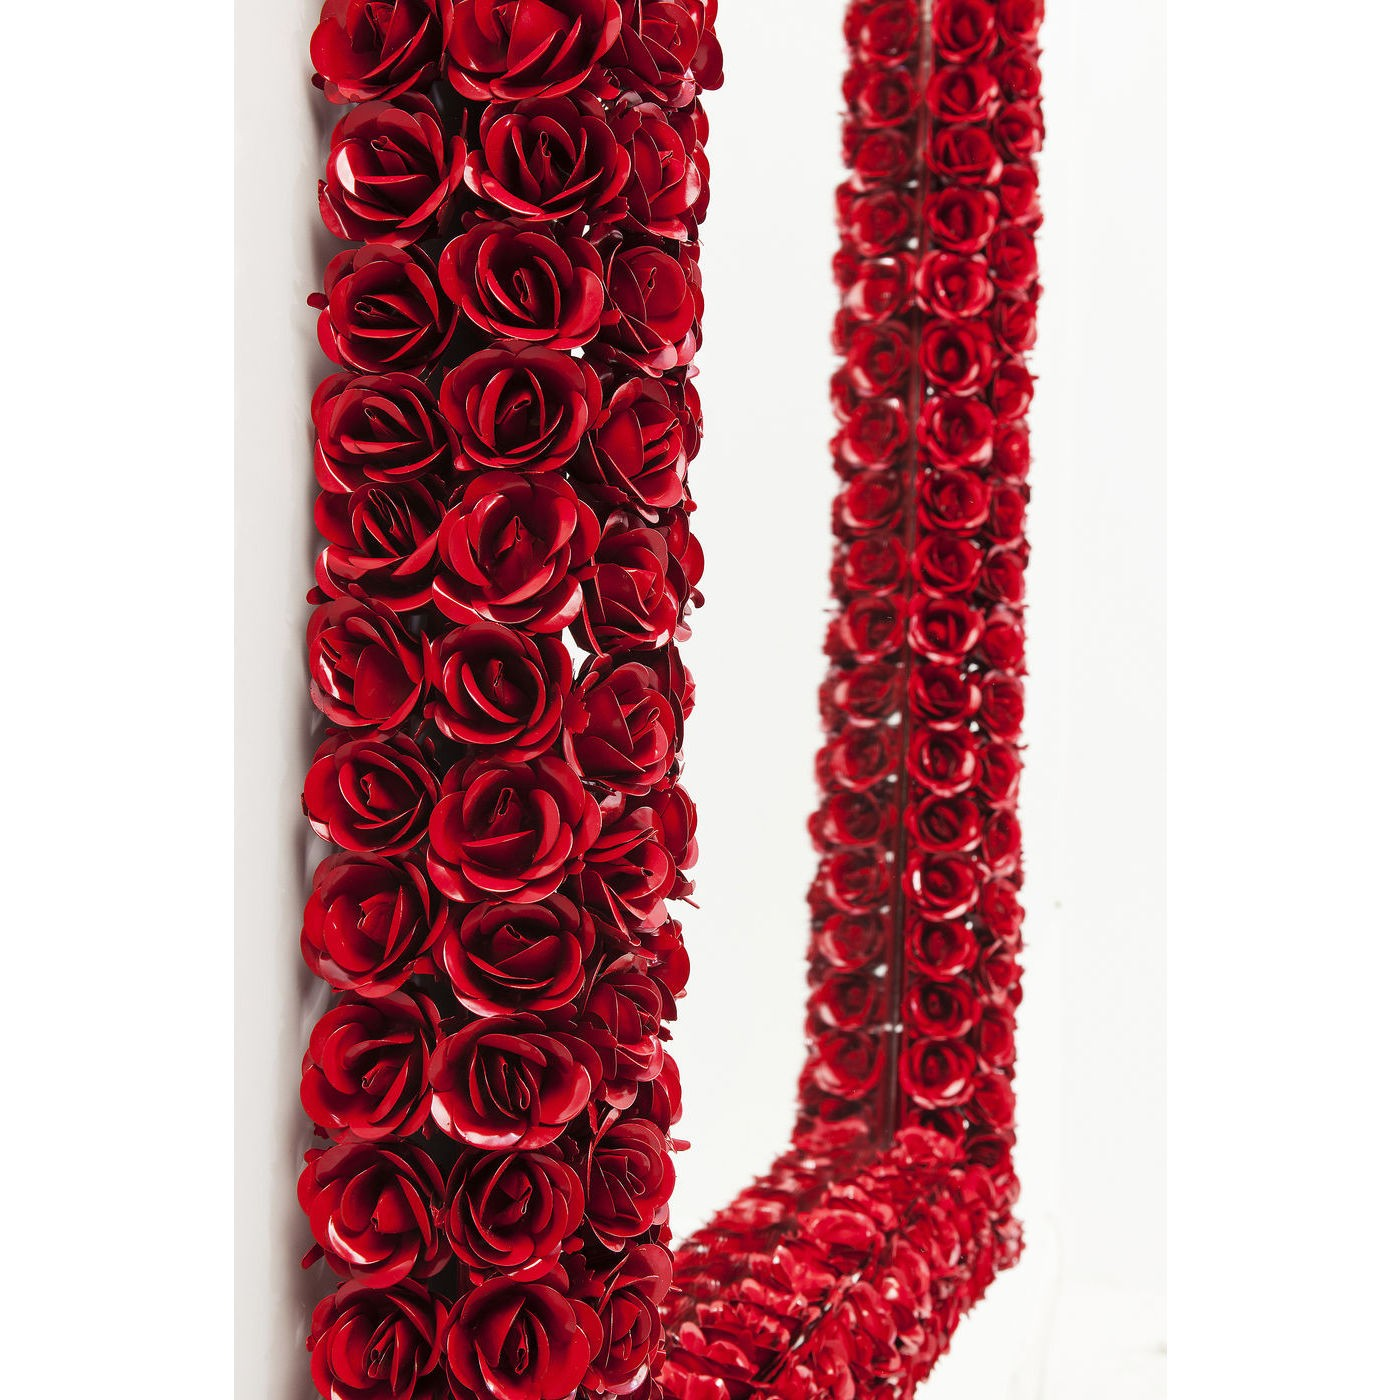 Miroir roses rouges rectangulaire 180x80cm Kare Design